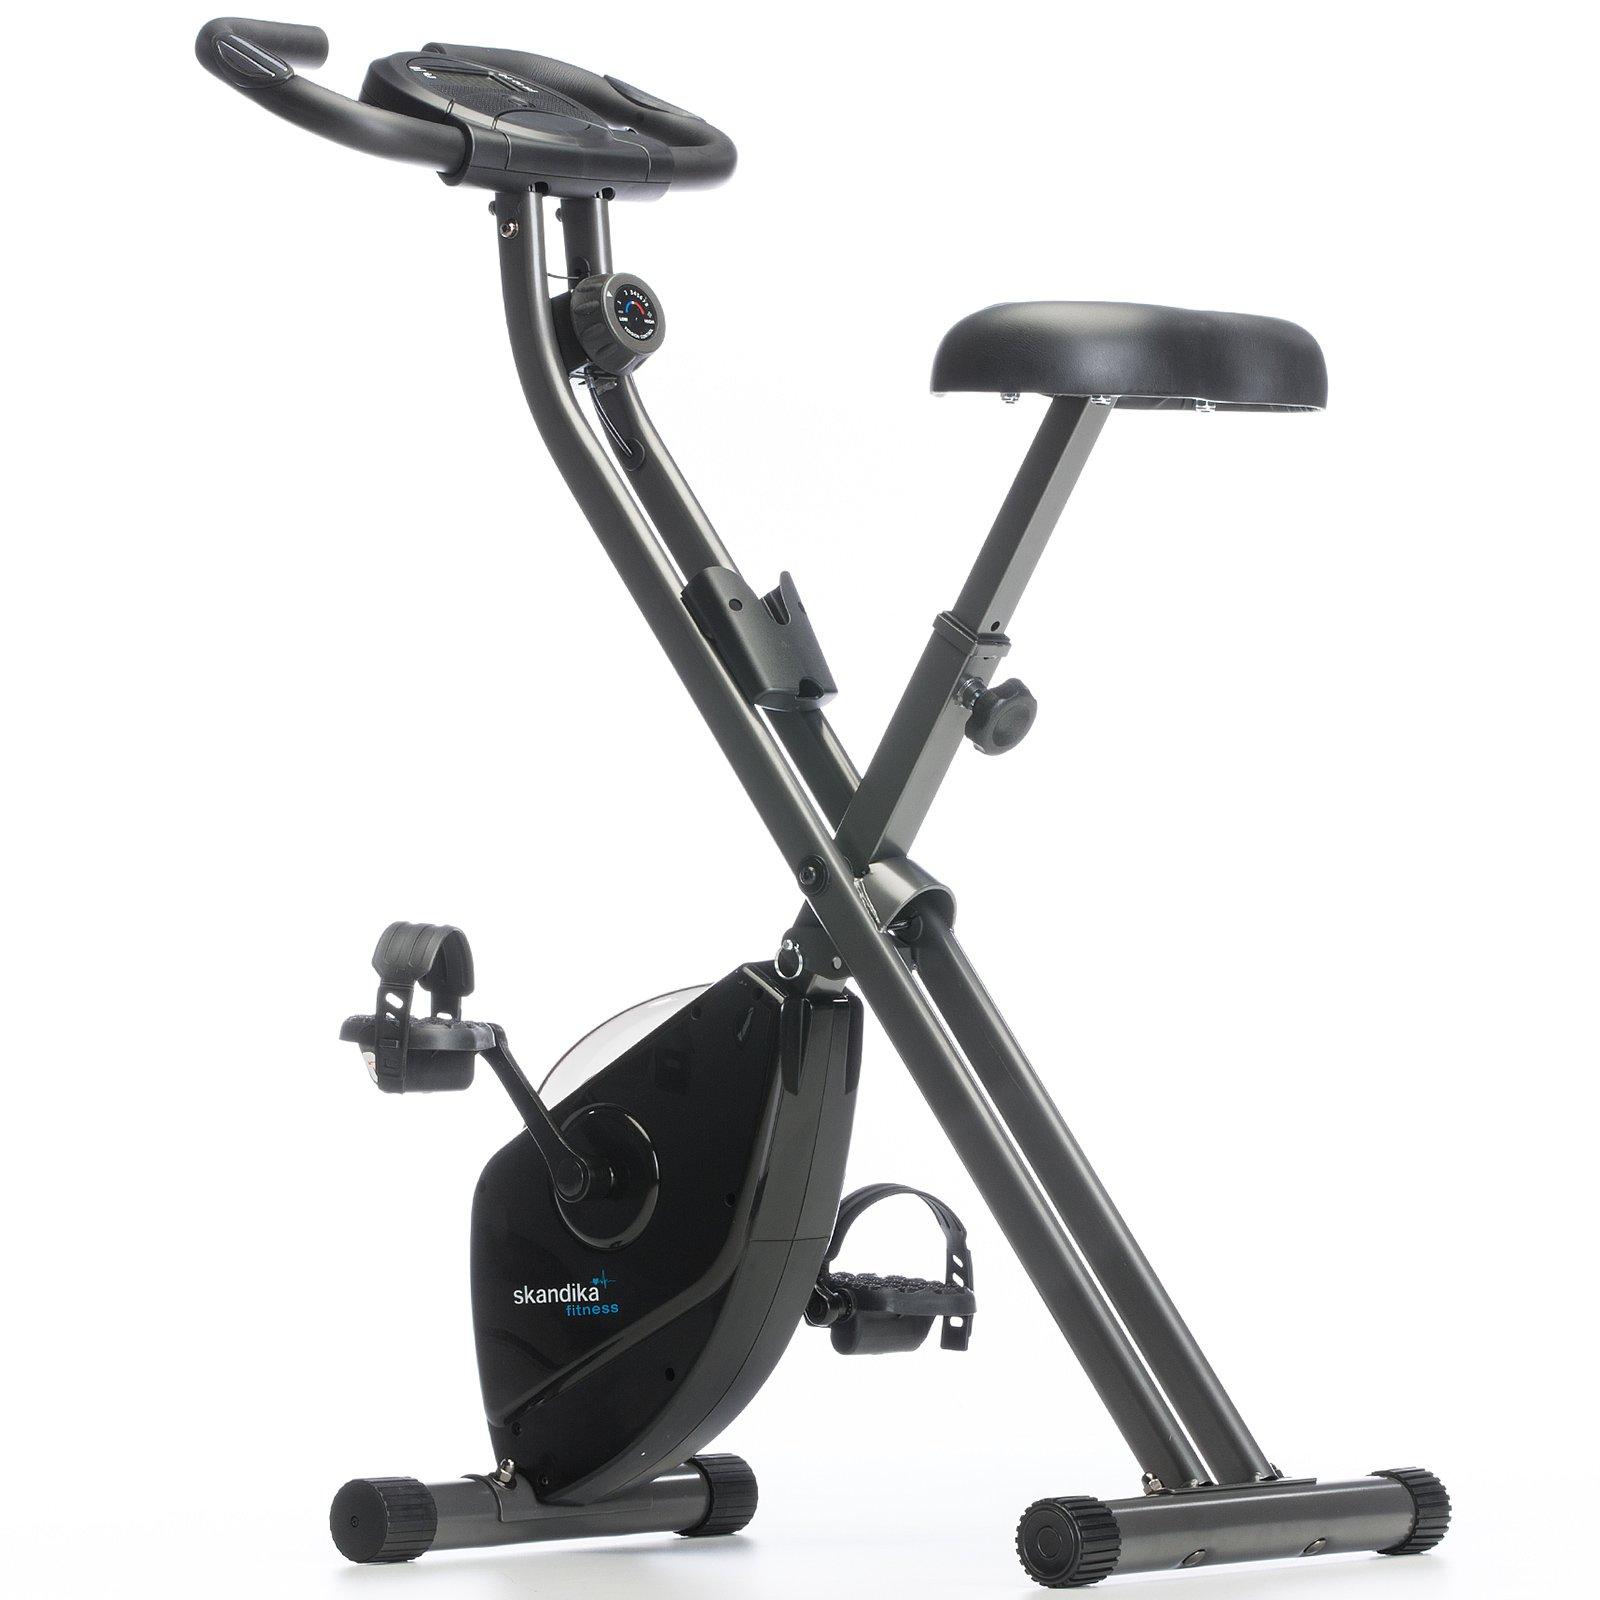 Skandika Foldaway X de 1000 Fitness Bicicleta Estática Plegable con sensores de pulso de mano,